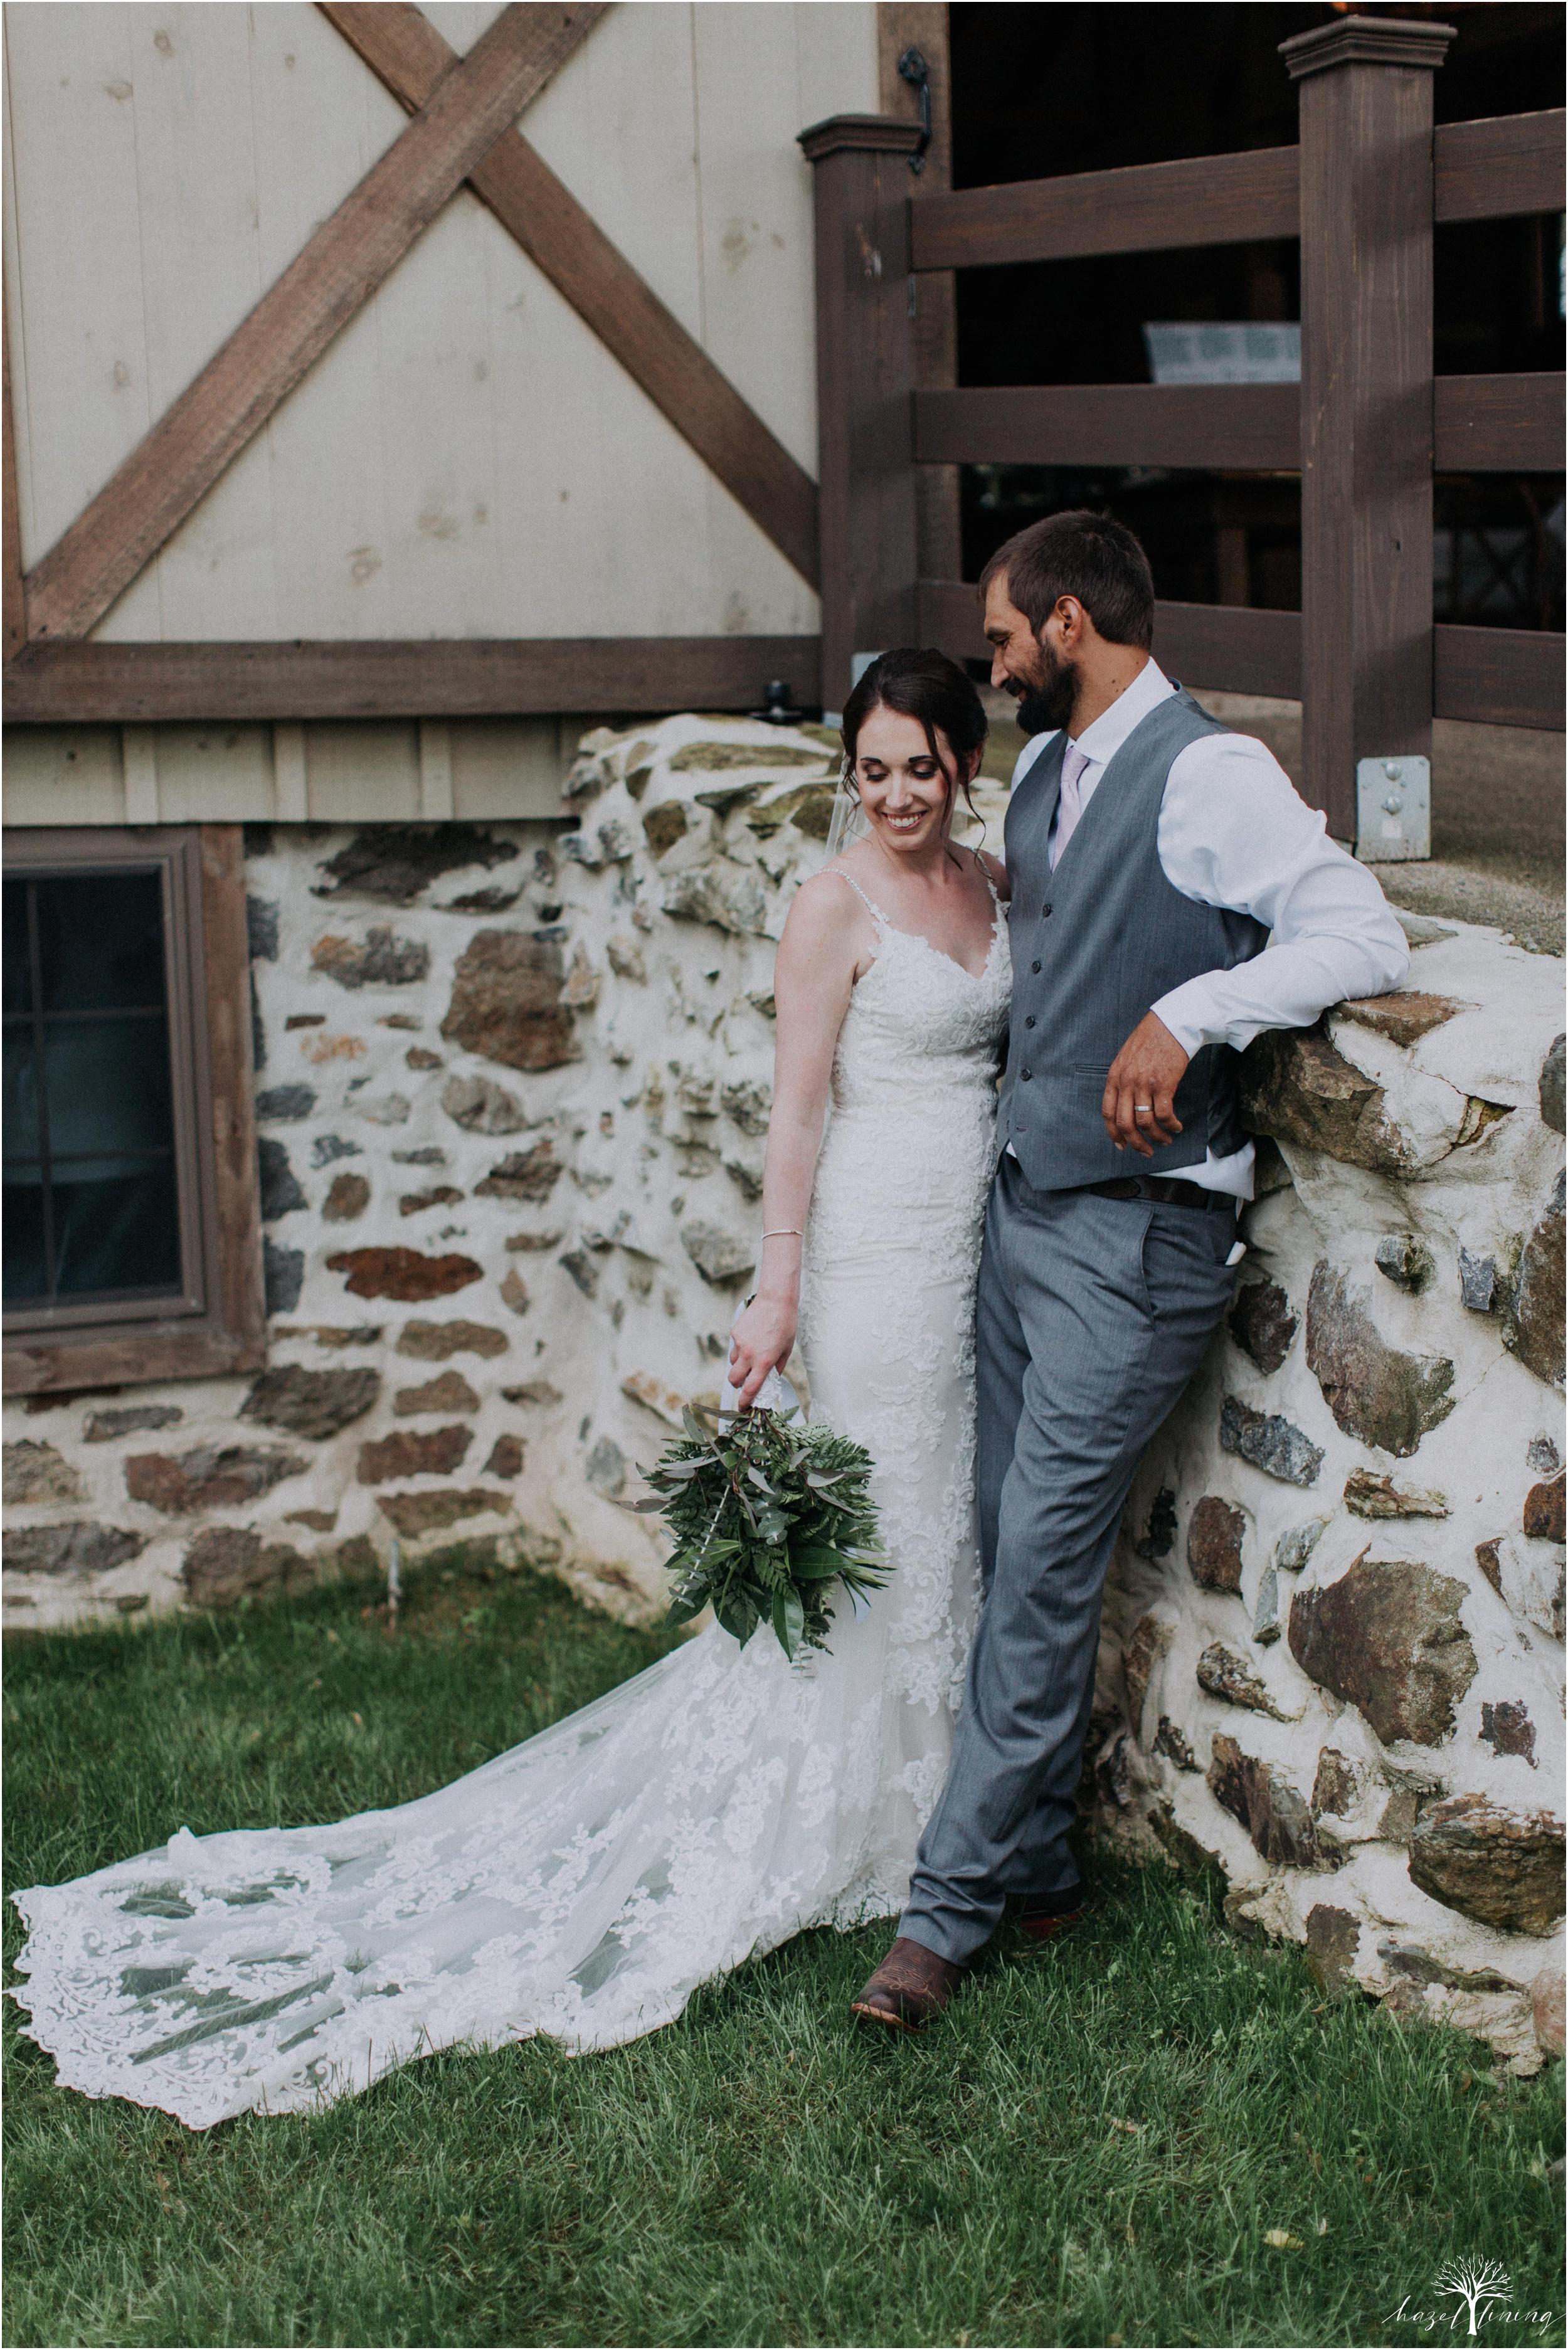 hazel-lining-travel-wedding-elopement-photography-lisa-landon-shoemaker-the-farm-bakery-and-events-bucks-county-quakertown-pennsylvania-summer-country-outdoor-farm-wedding_0104.jpg